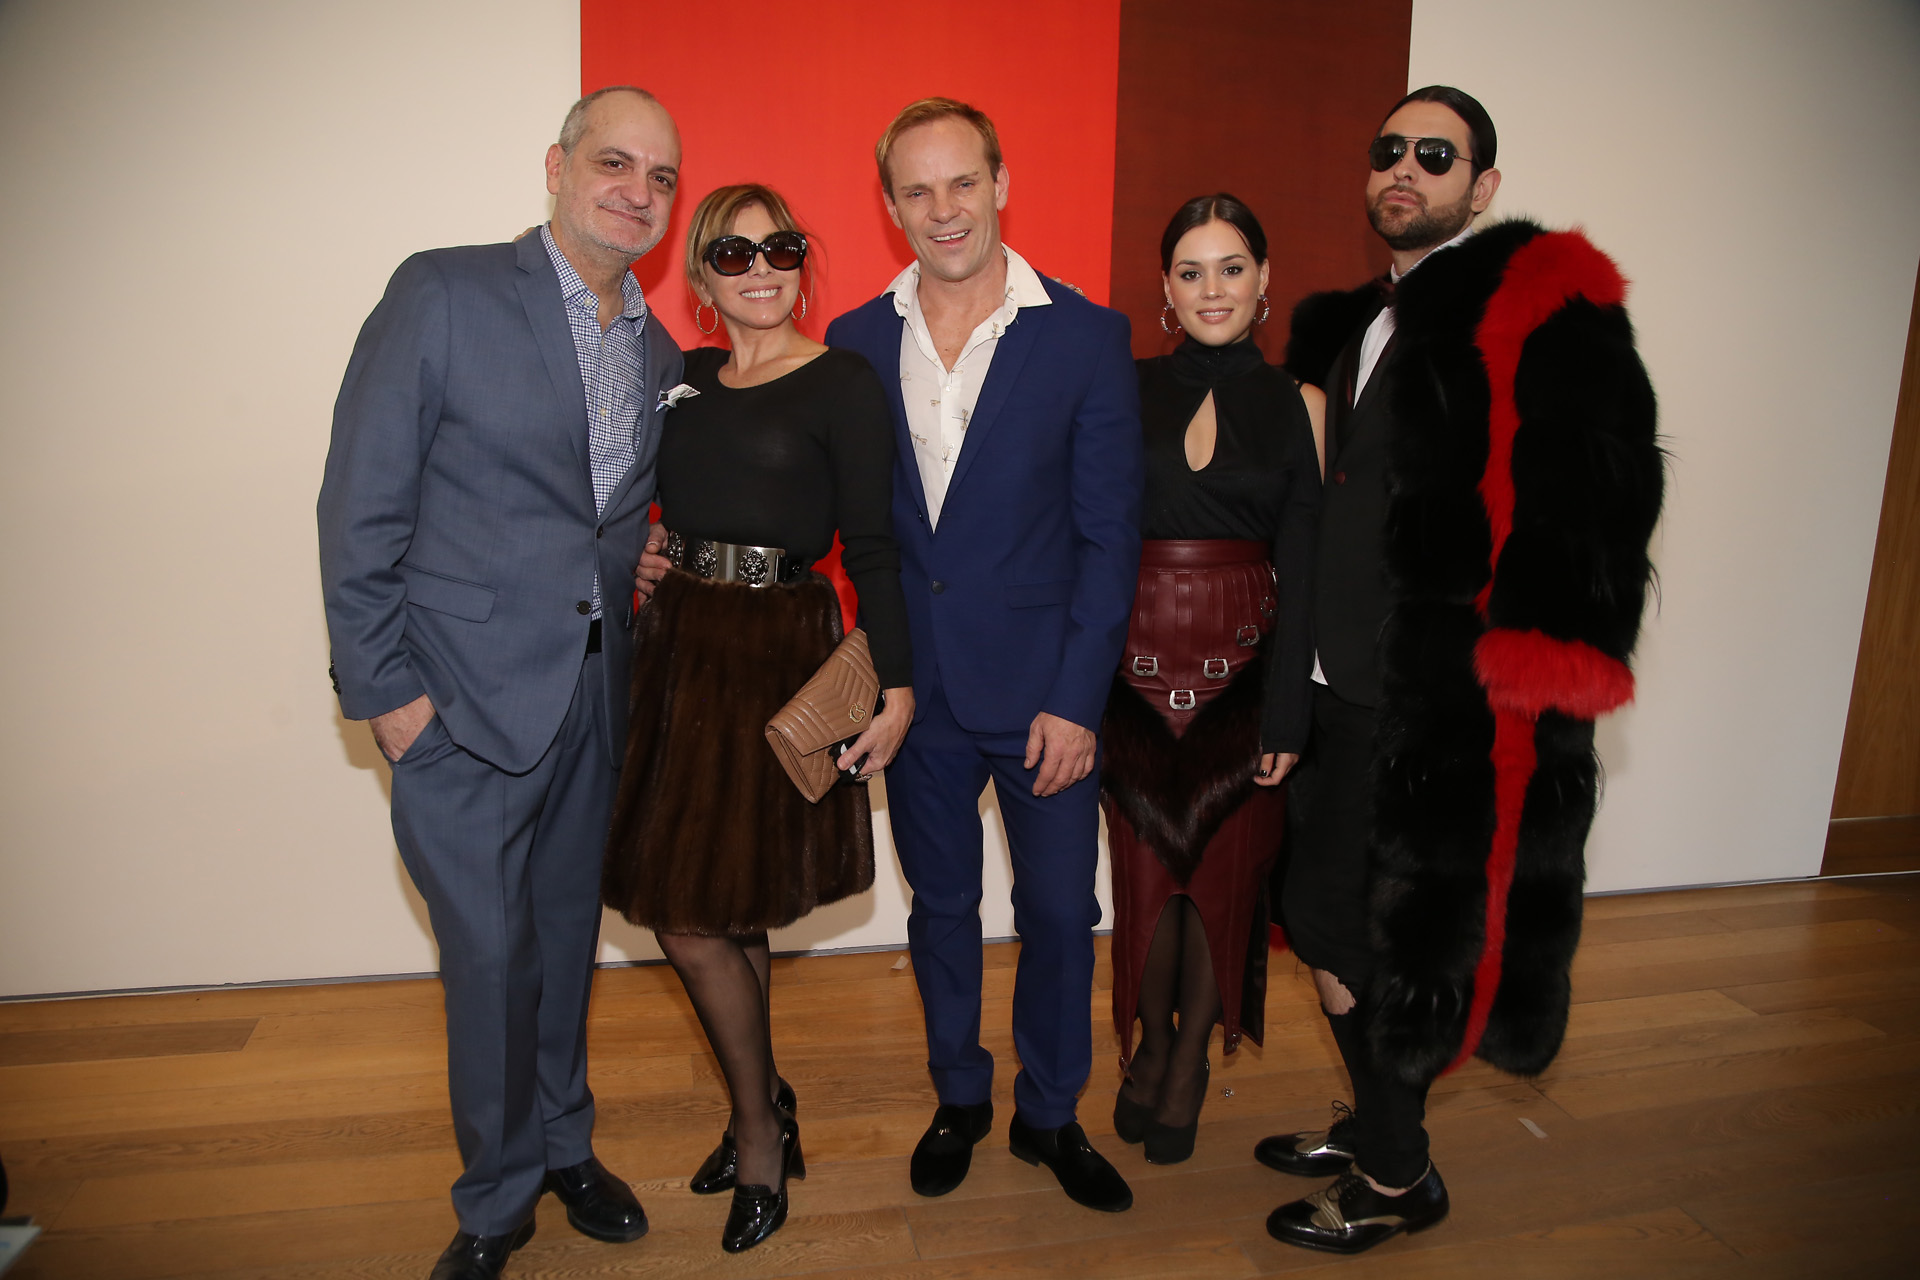 Laurencio Adot, Teresa Del Valle, Thiago Pinheiro, Valeria Baroni y Santiago Sapag